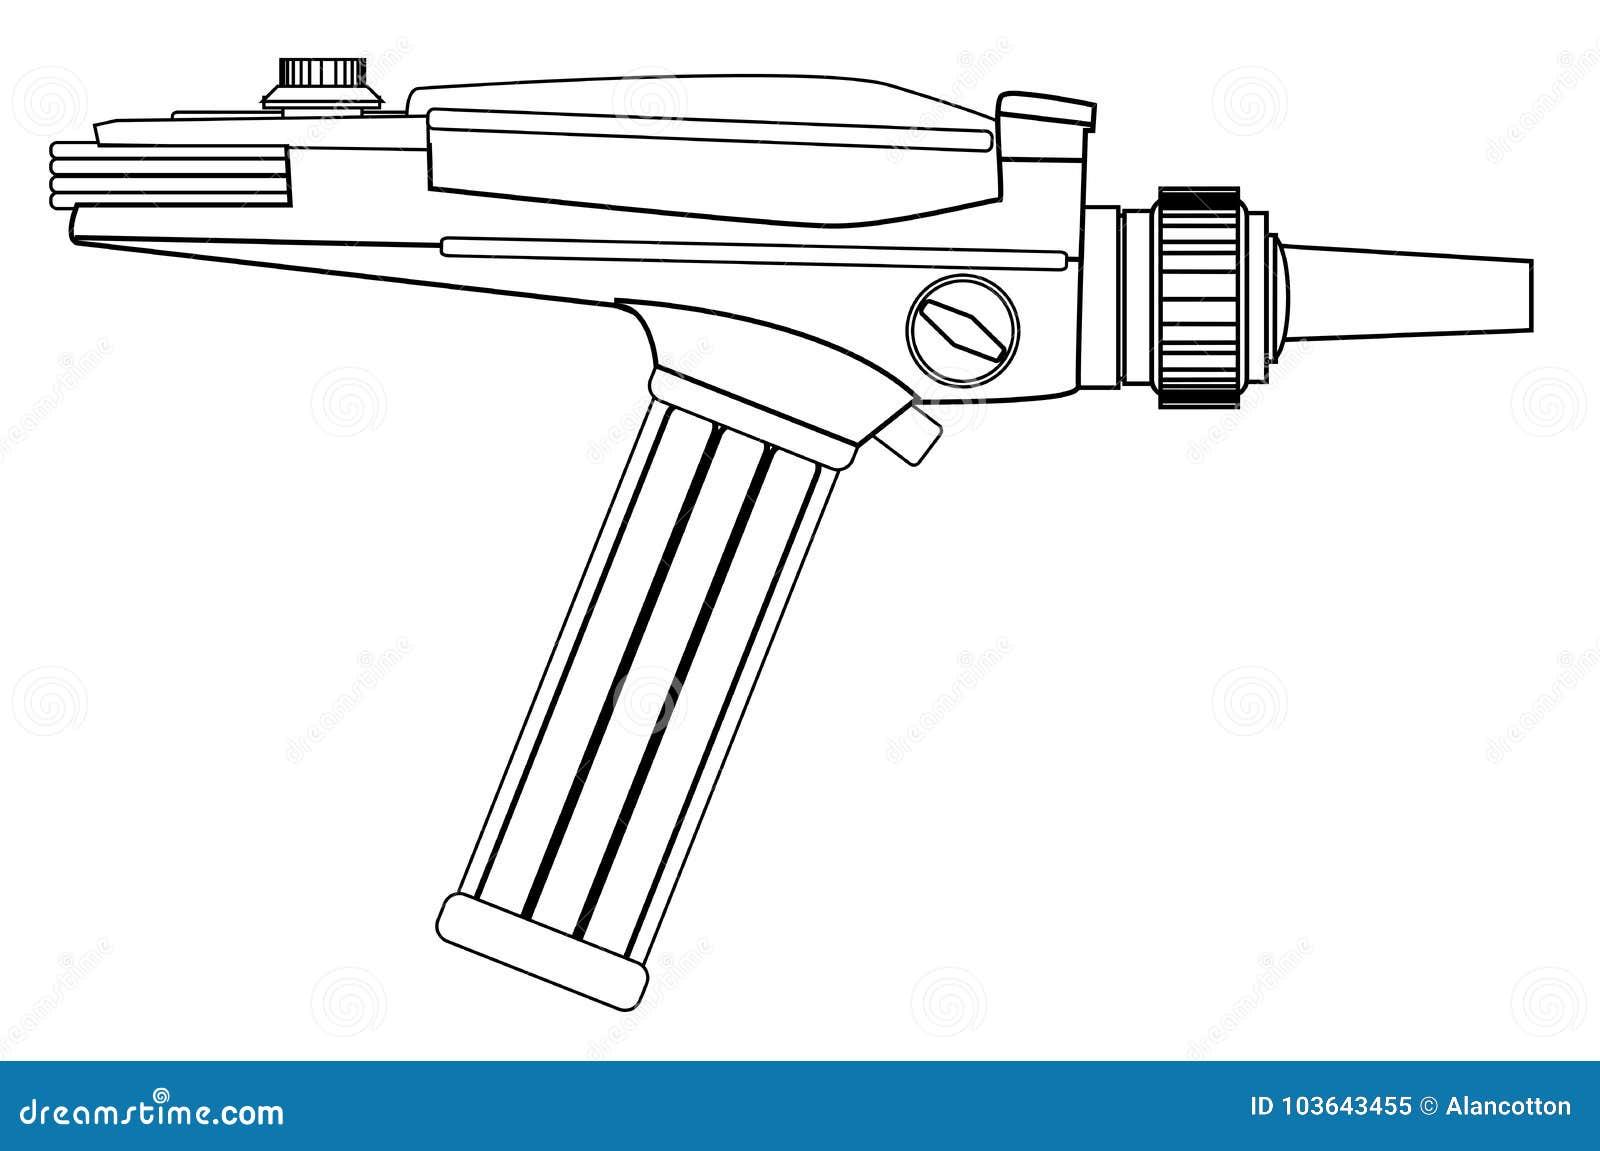 Line Drawing Gun : Ray gun line drawing vector illustratie